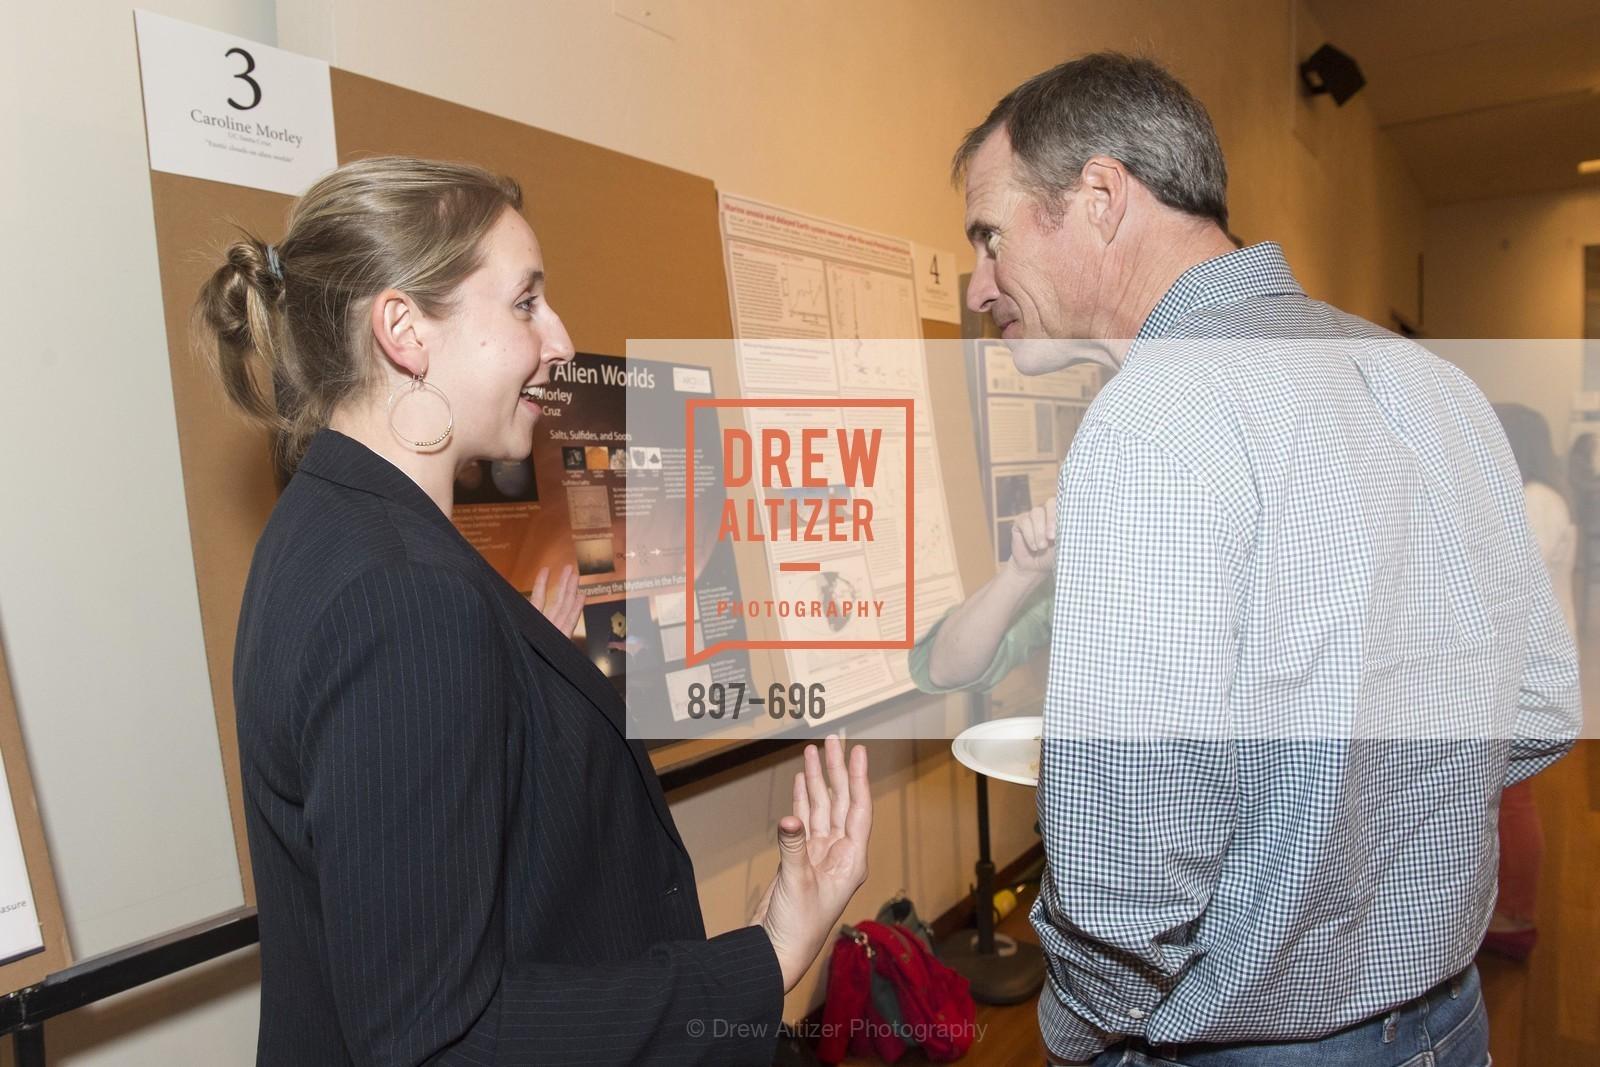 Caroline Morley, ARCS FOUNDATION Scholar Symposium, US, May 5th, 2015,Drew Altizer, Drew Altizer Photography, full-service agency, private events, San Francisco photographer, photographer california